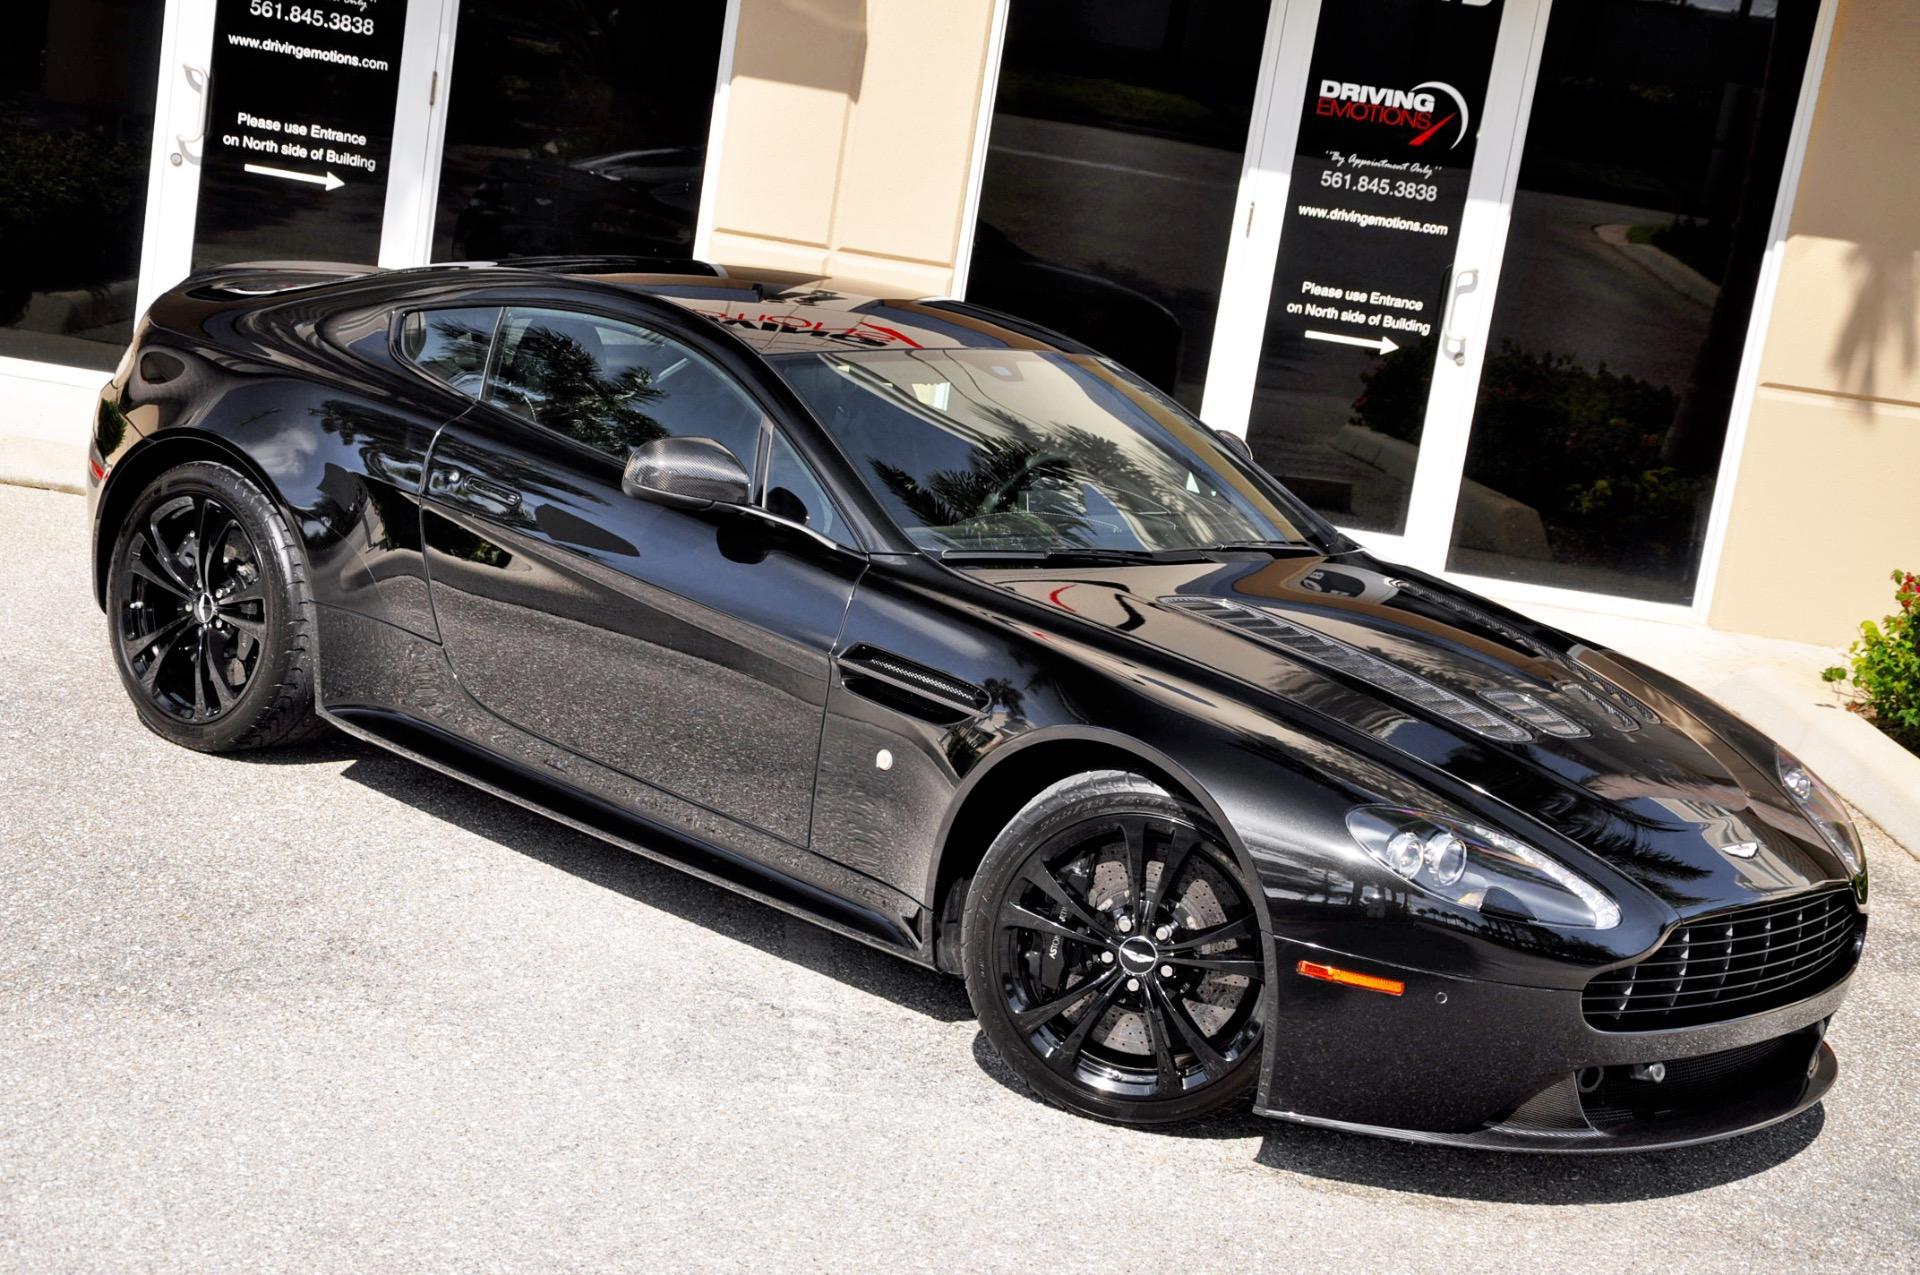 2012 Aston Martin V12 Vantage V12 Carbon Black Stock 6063 For Sale